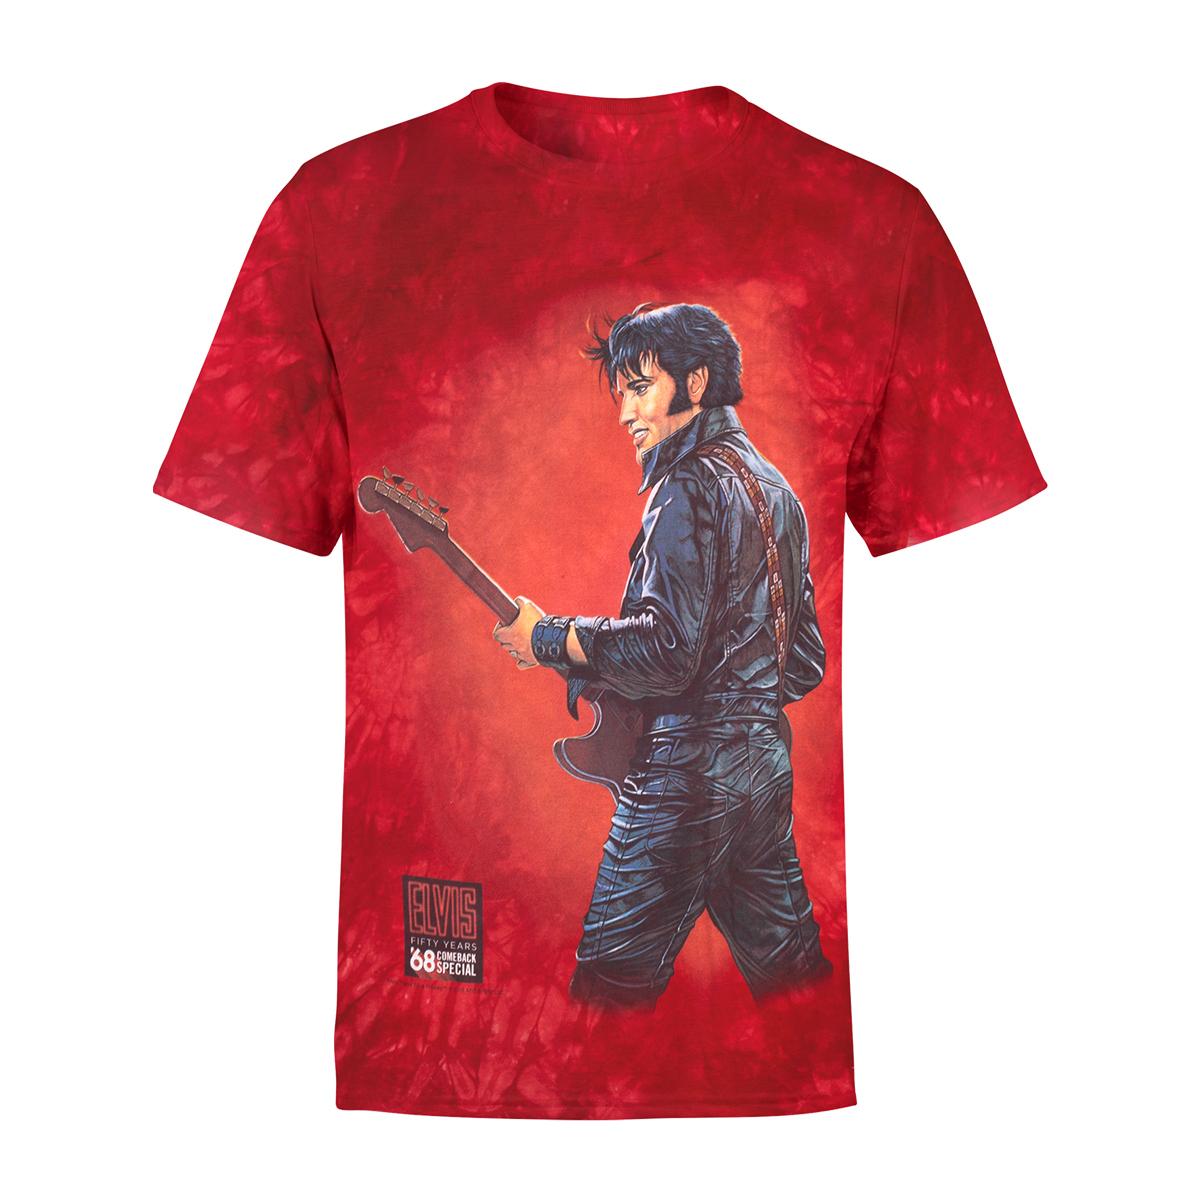 Elvis - '68 Comeback Special Red Guitar T-shirt